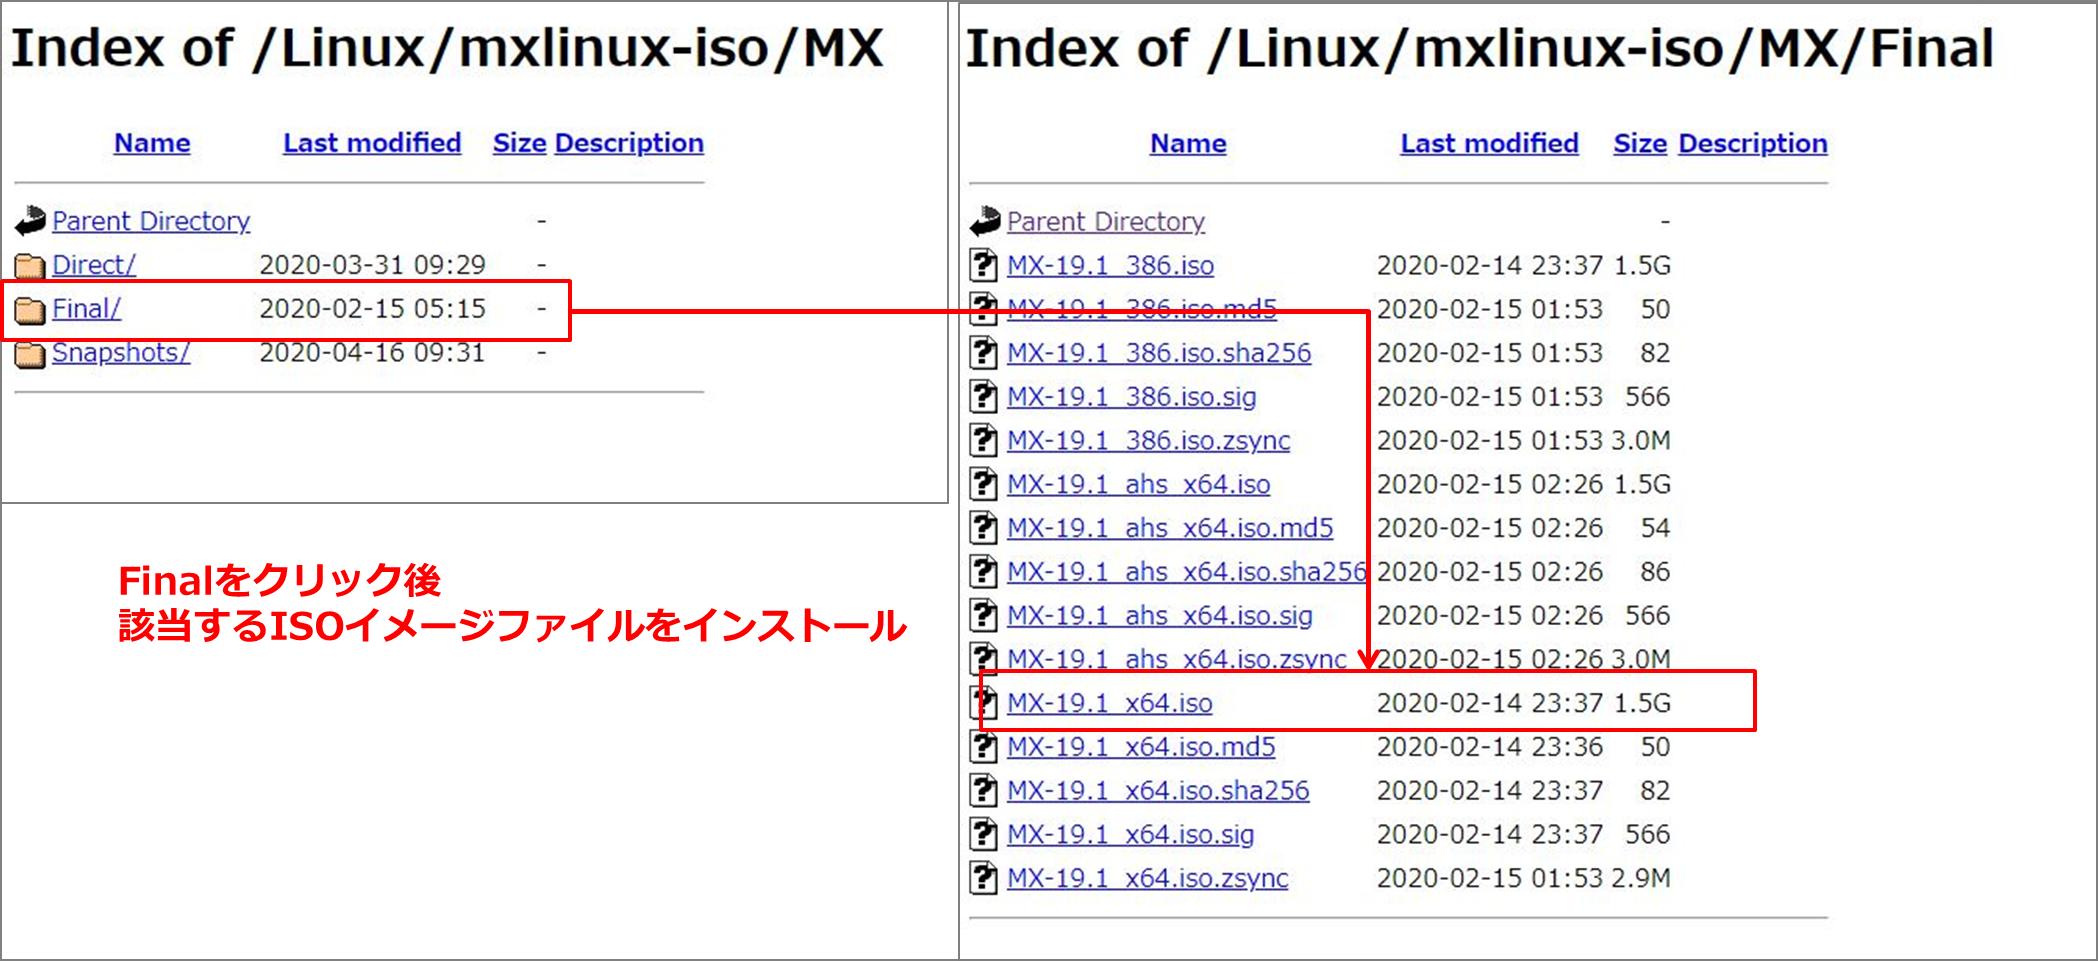 MXlinux_iso7